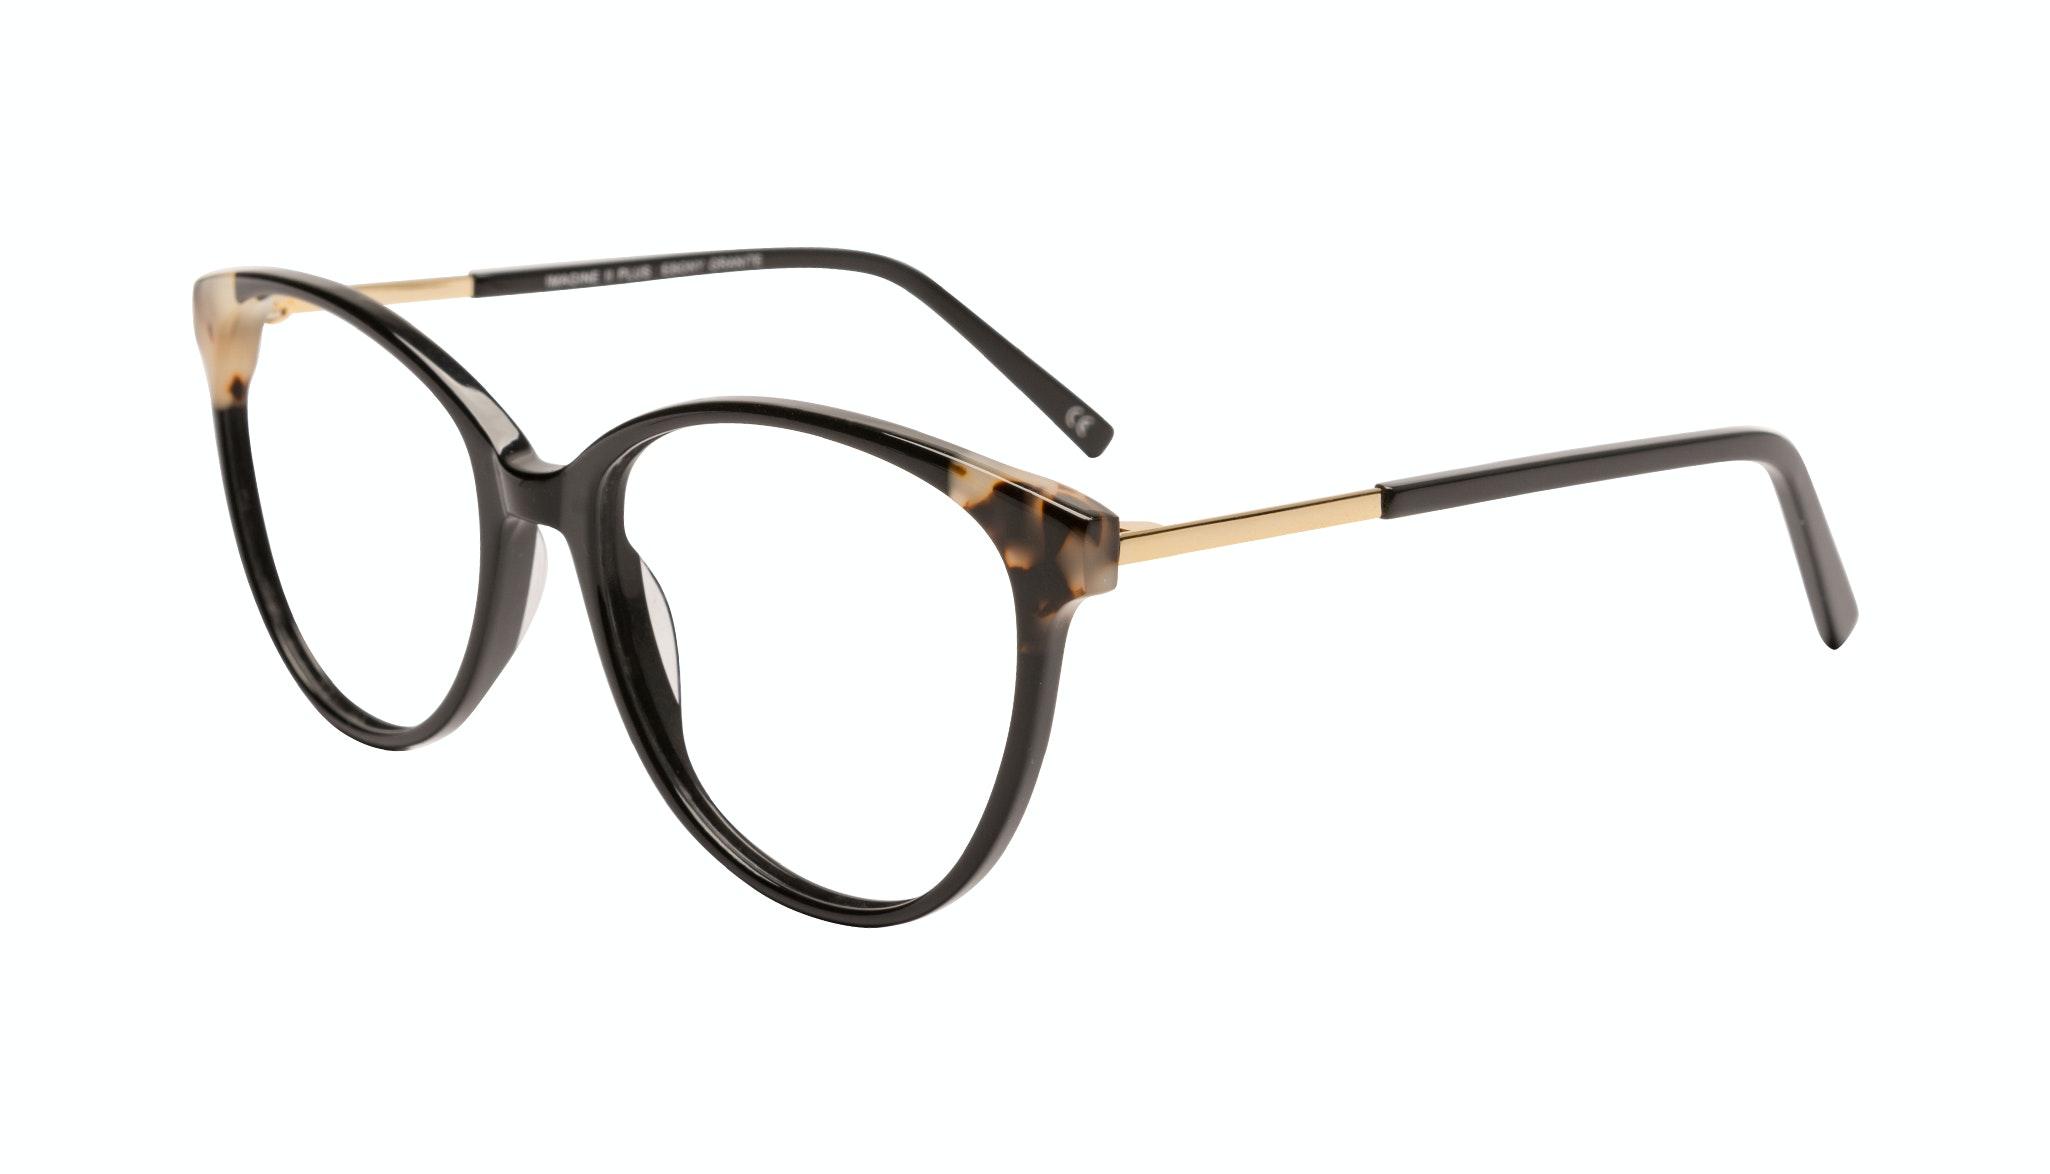 Affordable Fashion Glasses Round Eyeglasses Women Imagine II Plus Ebony Granite Tilt